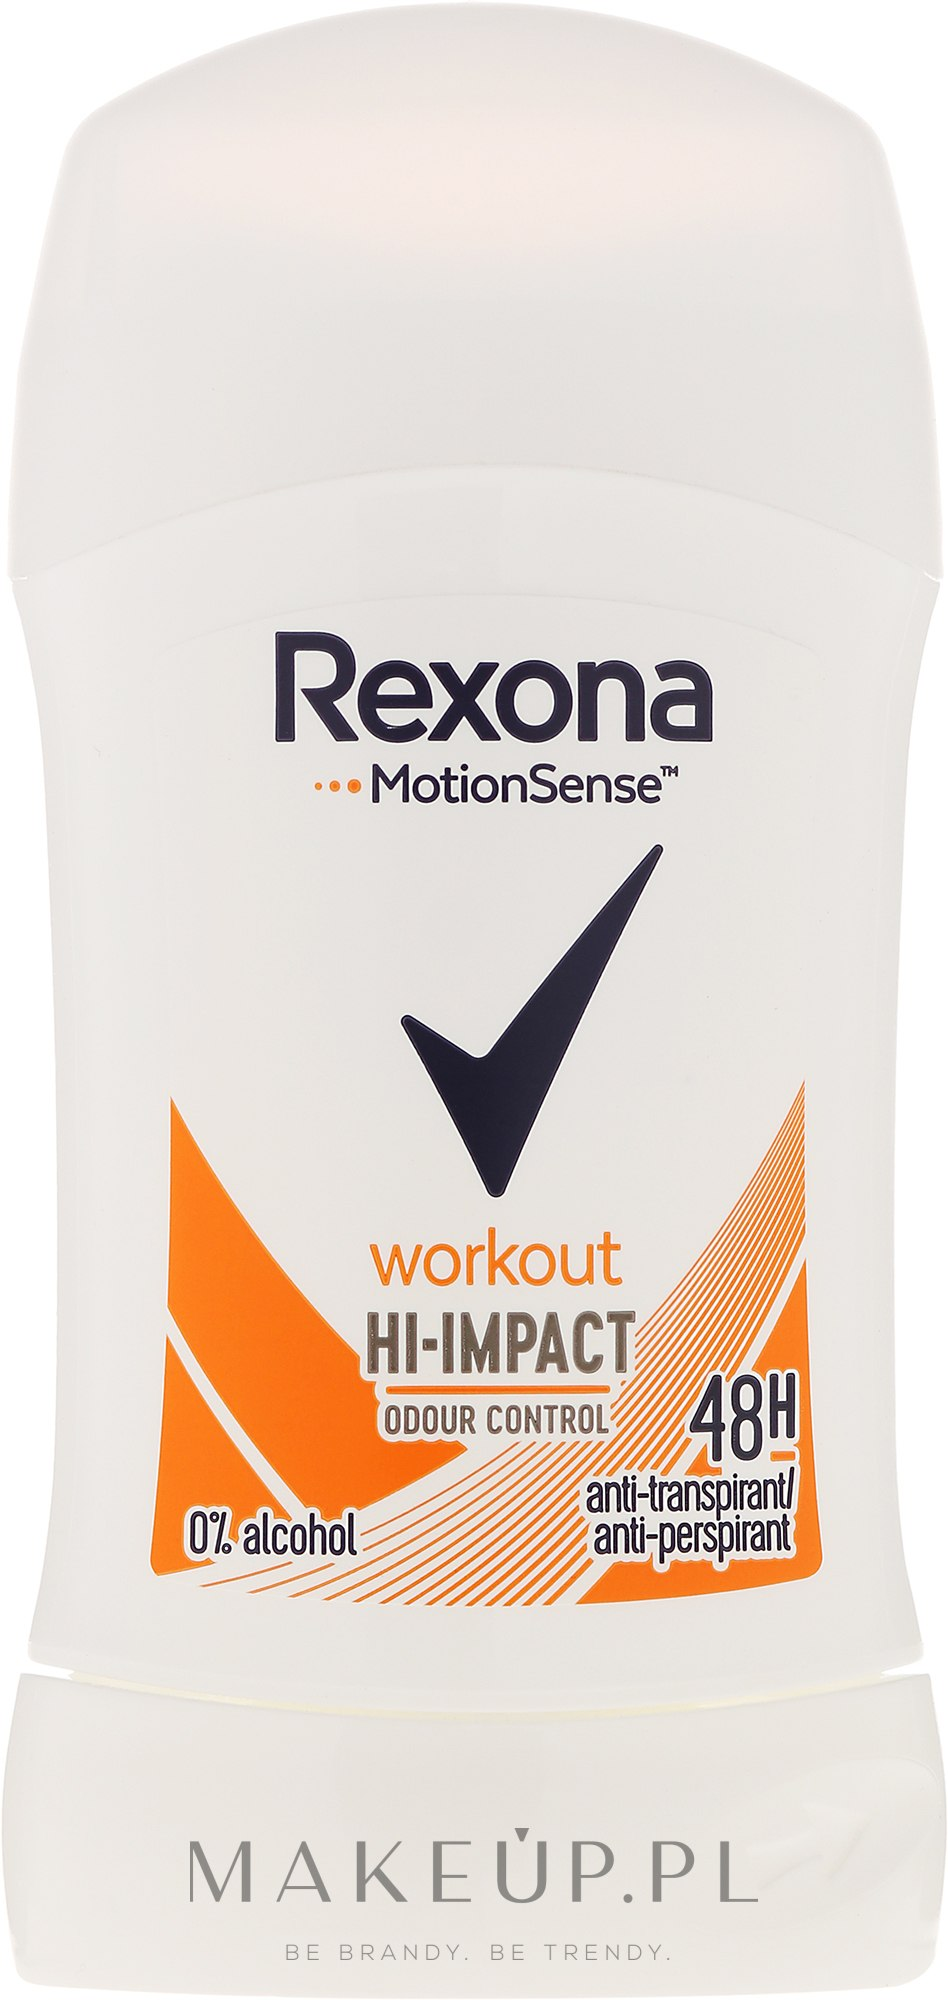 Antyperspirant w sztyfcie - Rexona Motionsense Workout Hi-impact 48h Anti-perspirant — фото 40 ml